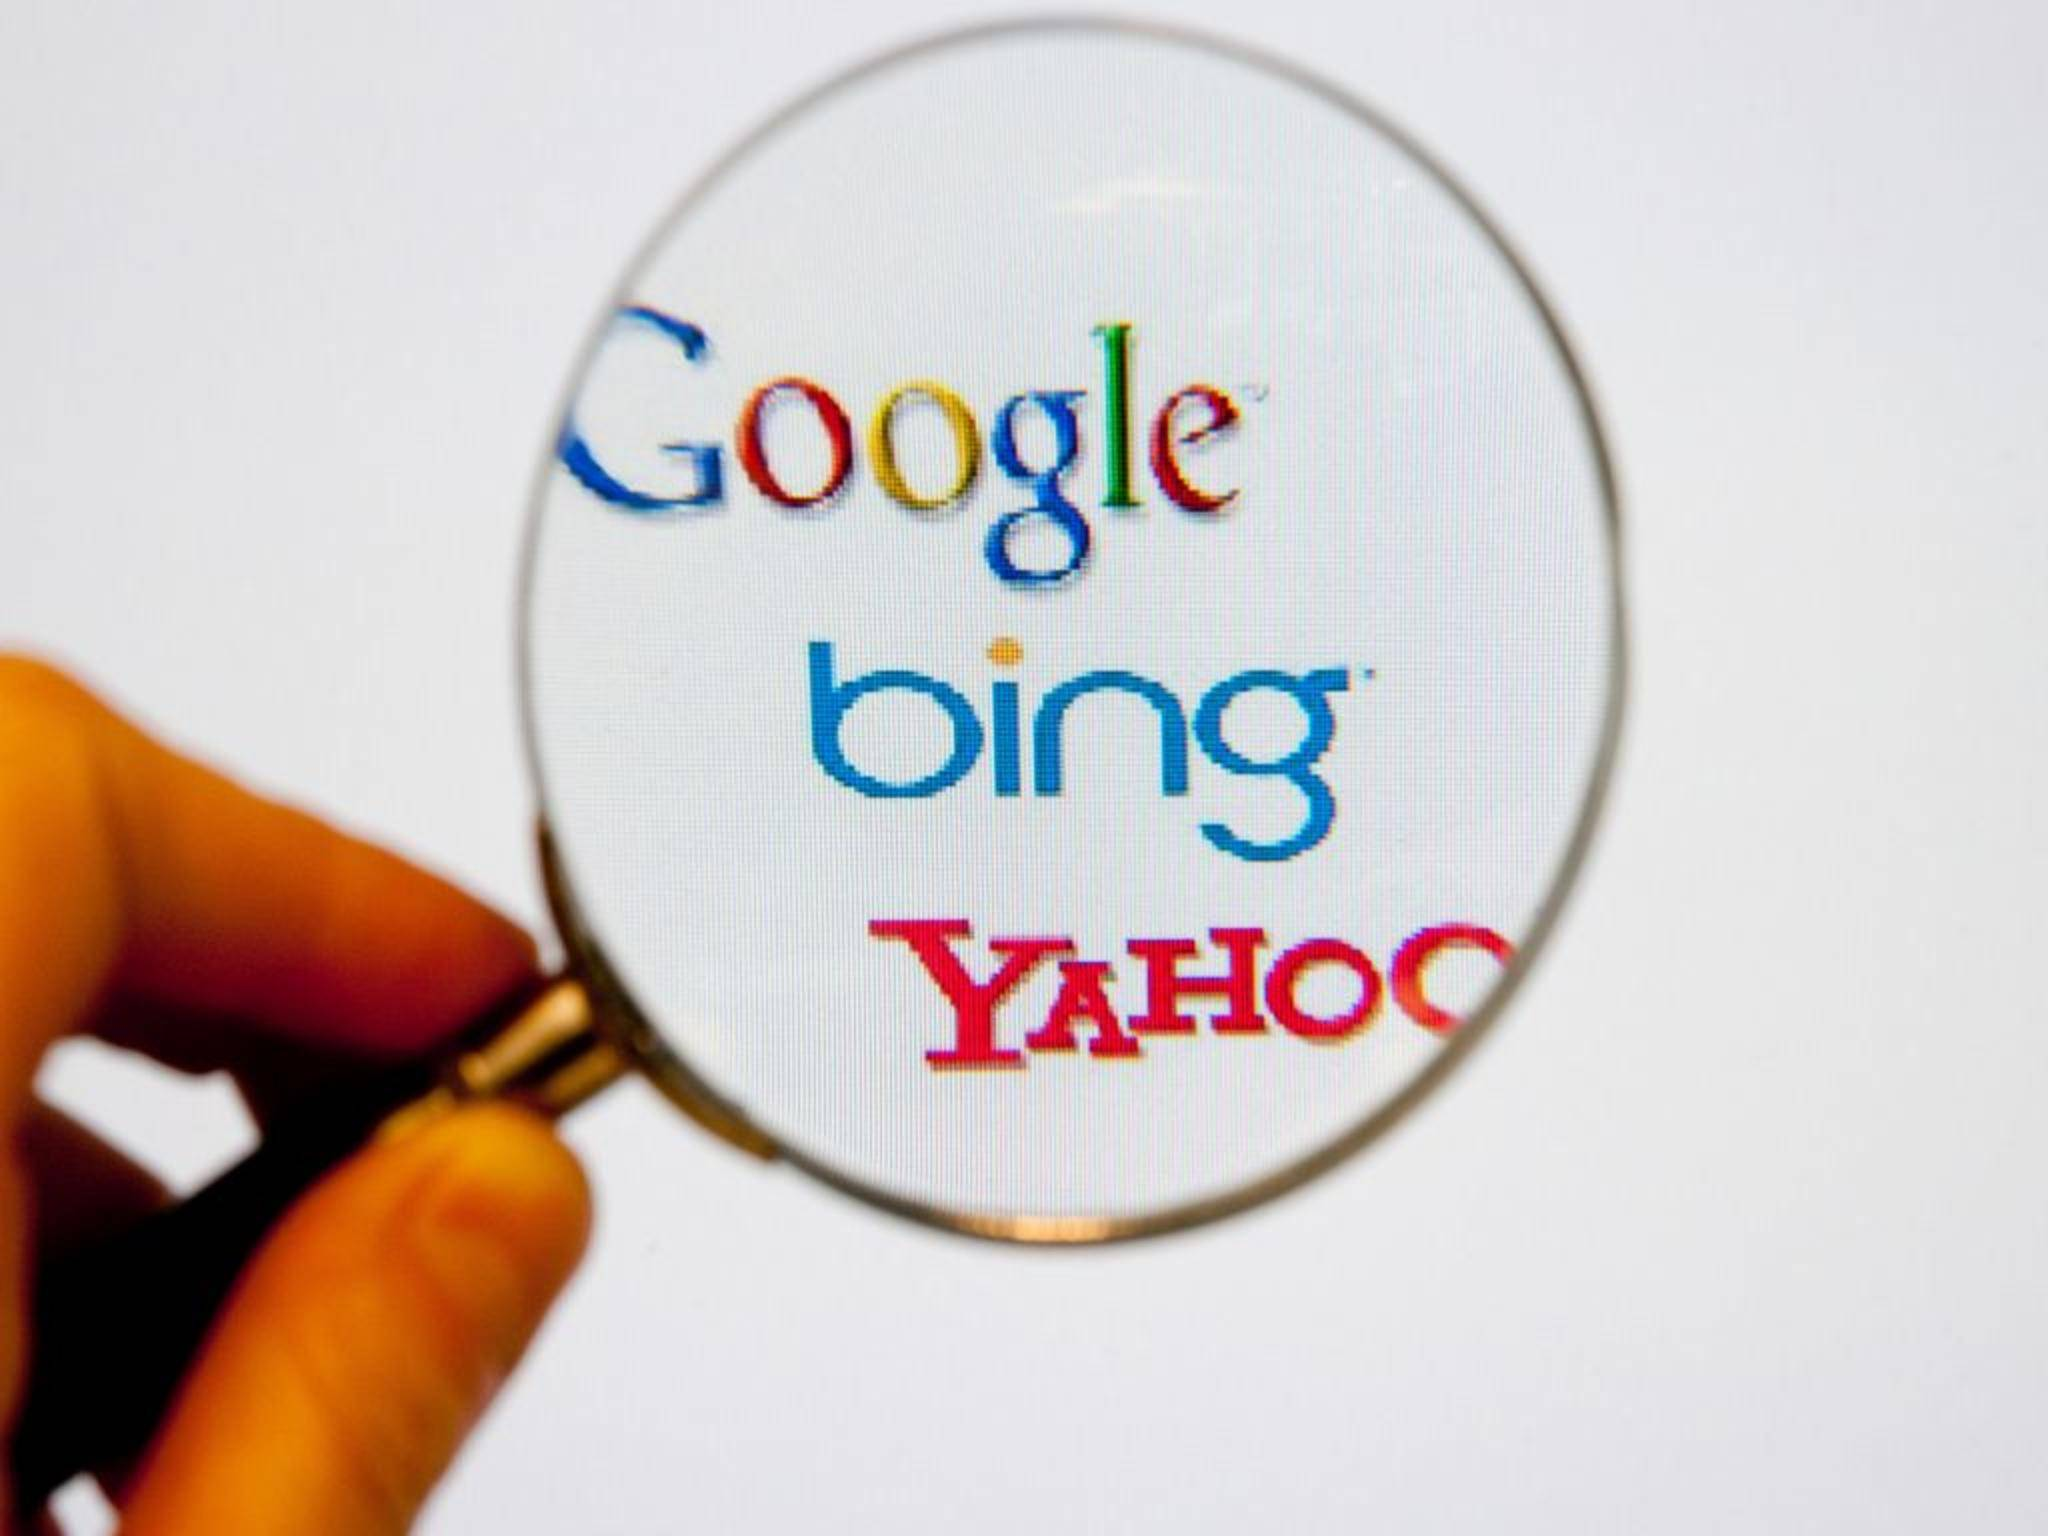 Google, Bing oder Yahoo? Apple  hat die Qual der Wahl.